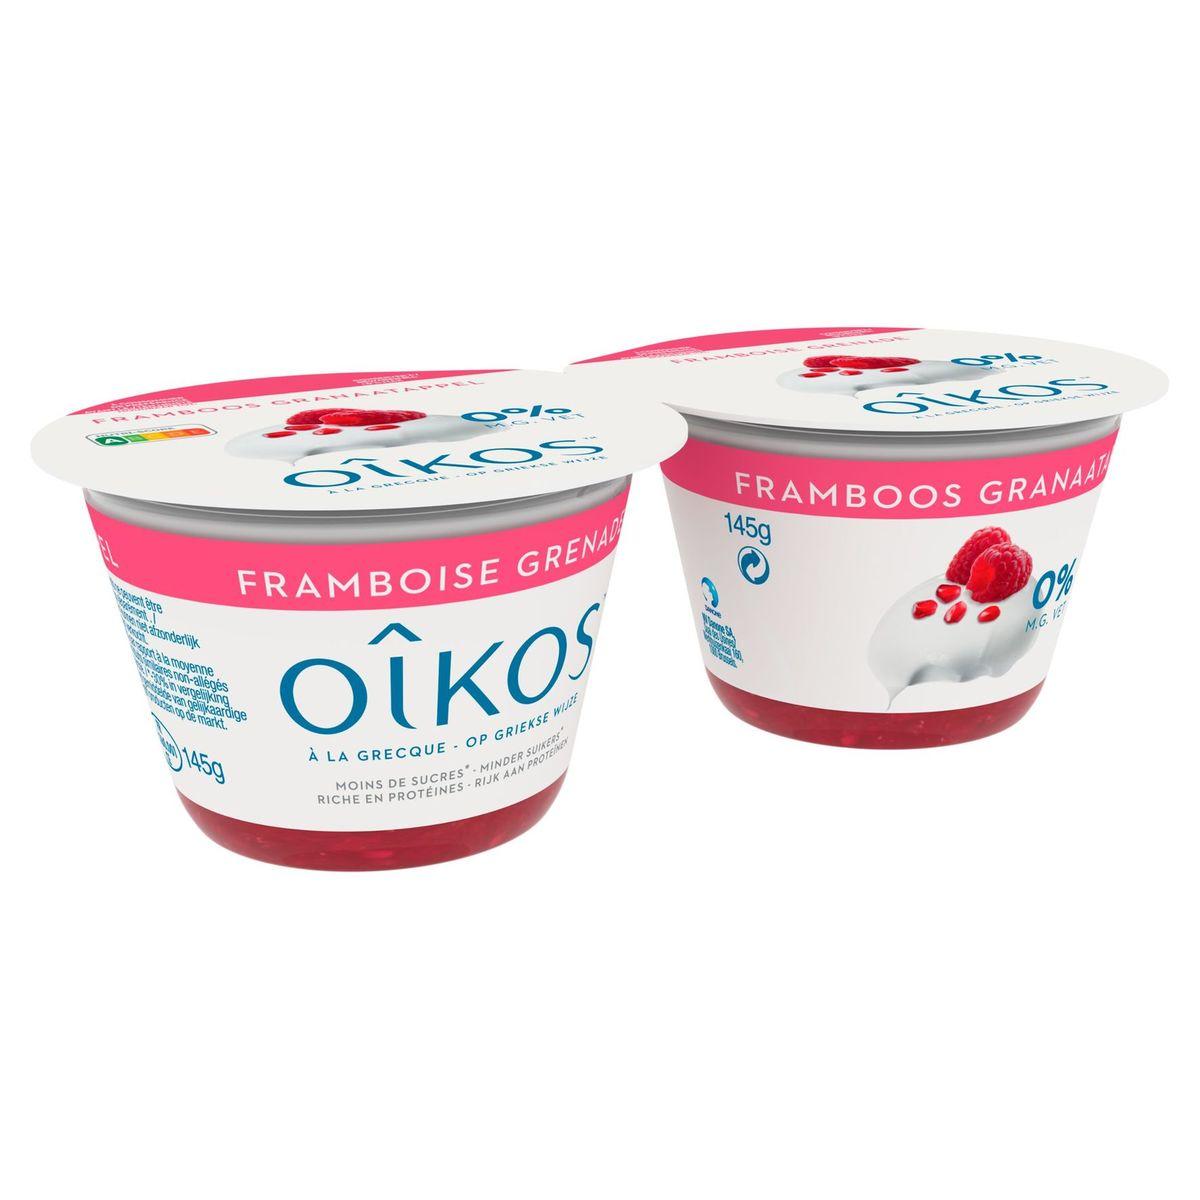 Oikos Yaourt à la Grecque Framboise Grenade 0% 2 x 145 g